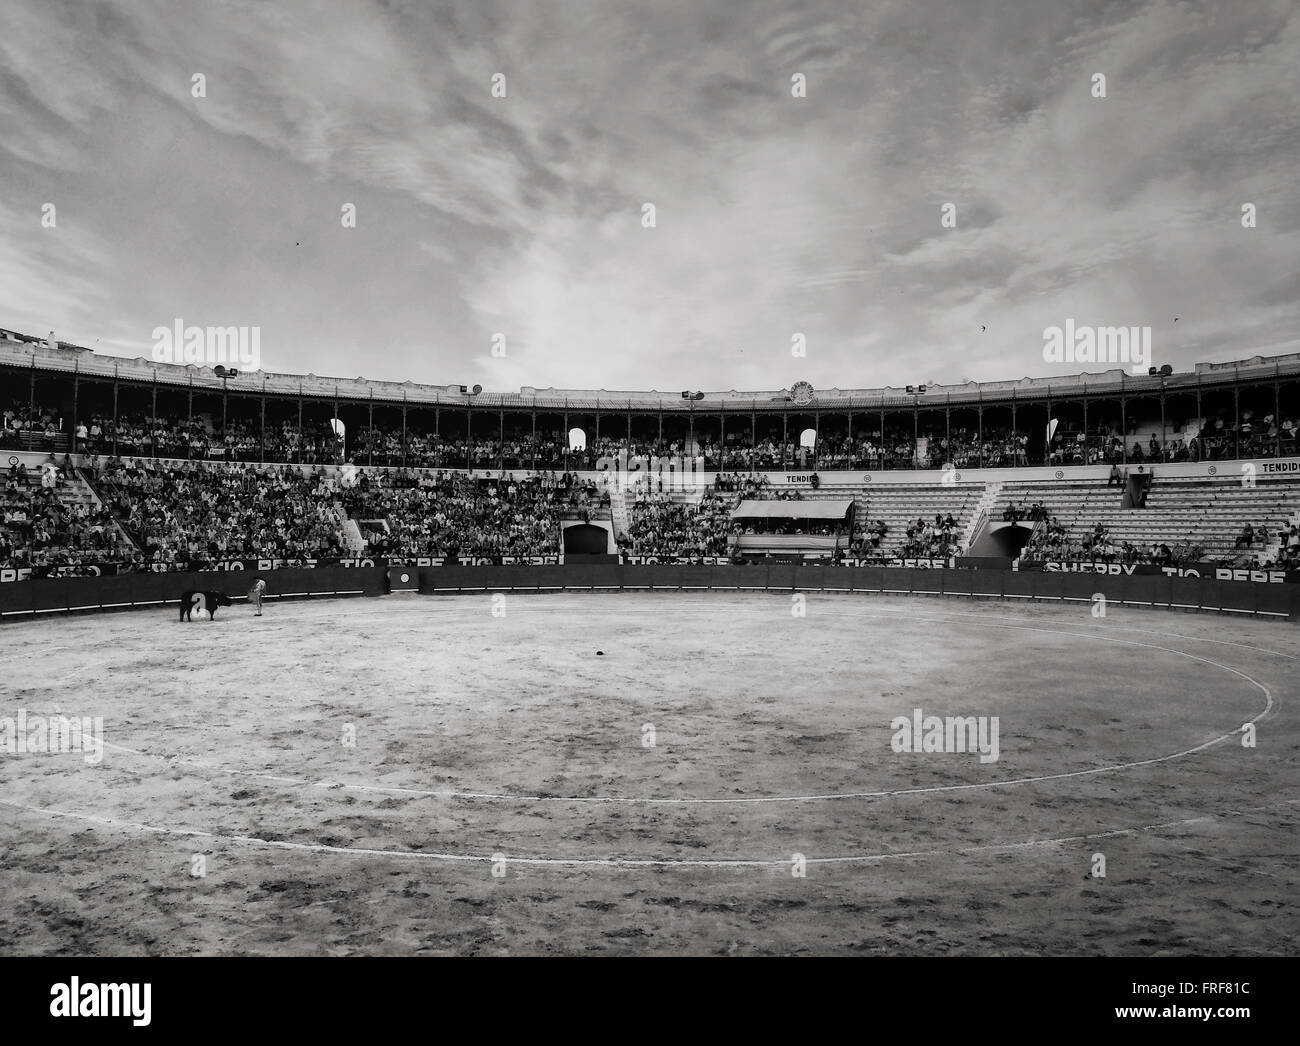 Bullfighting in Andalucia, Spain -  13/02/2013  -  Spain / Andalusia / Jerez de la Frontera  -  Bullfighting in Andalucia, Spain Stock Photo